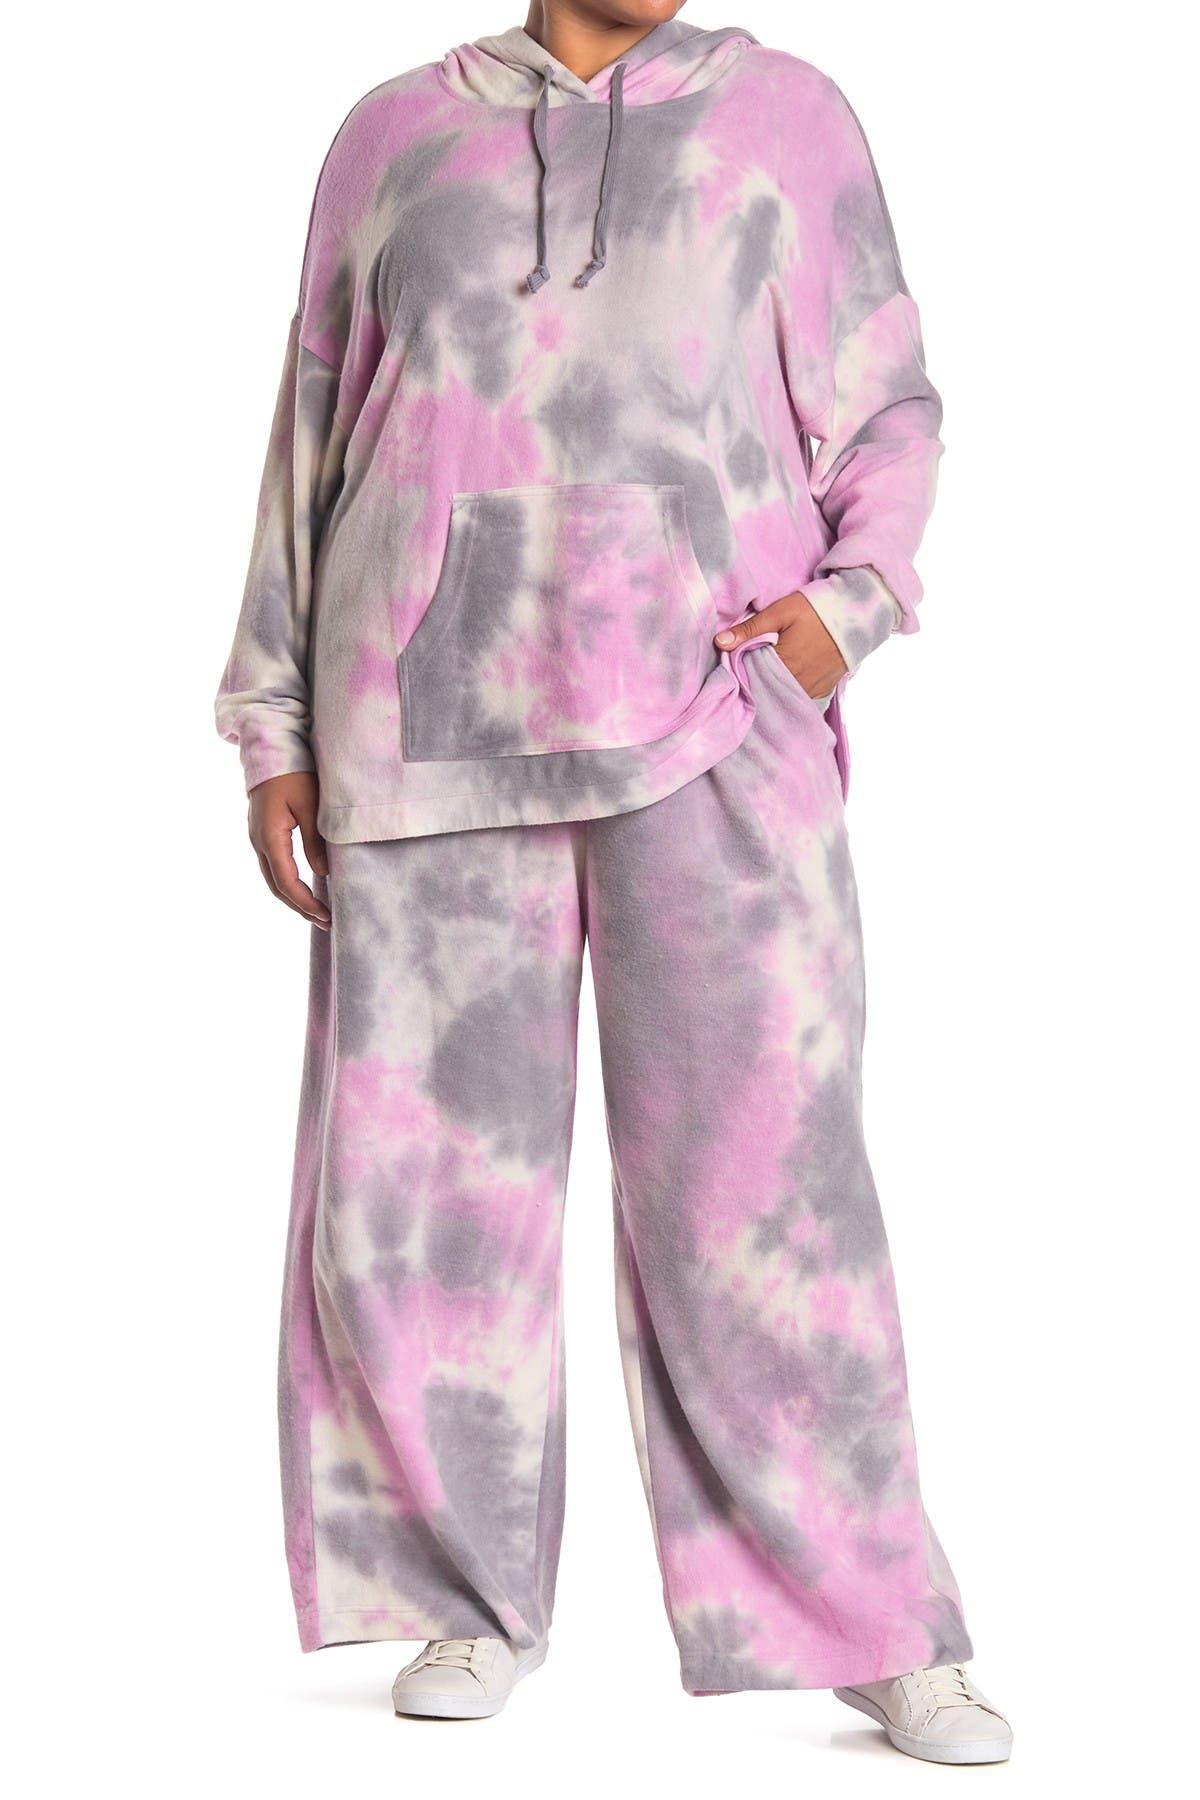 Image of MELLODAY Brushed Tie Dye Wide Leg Pants